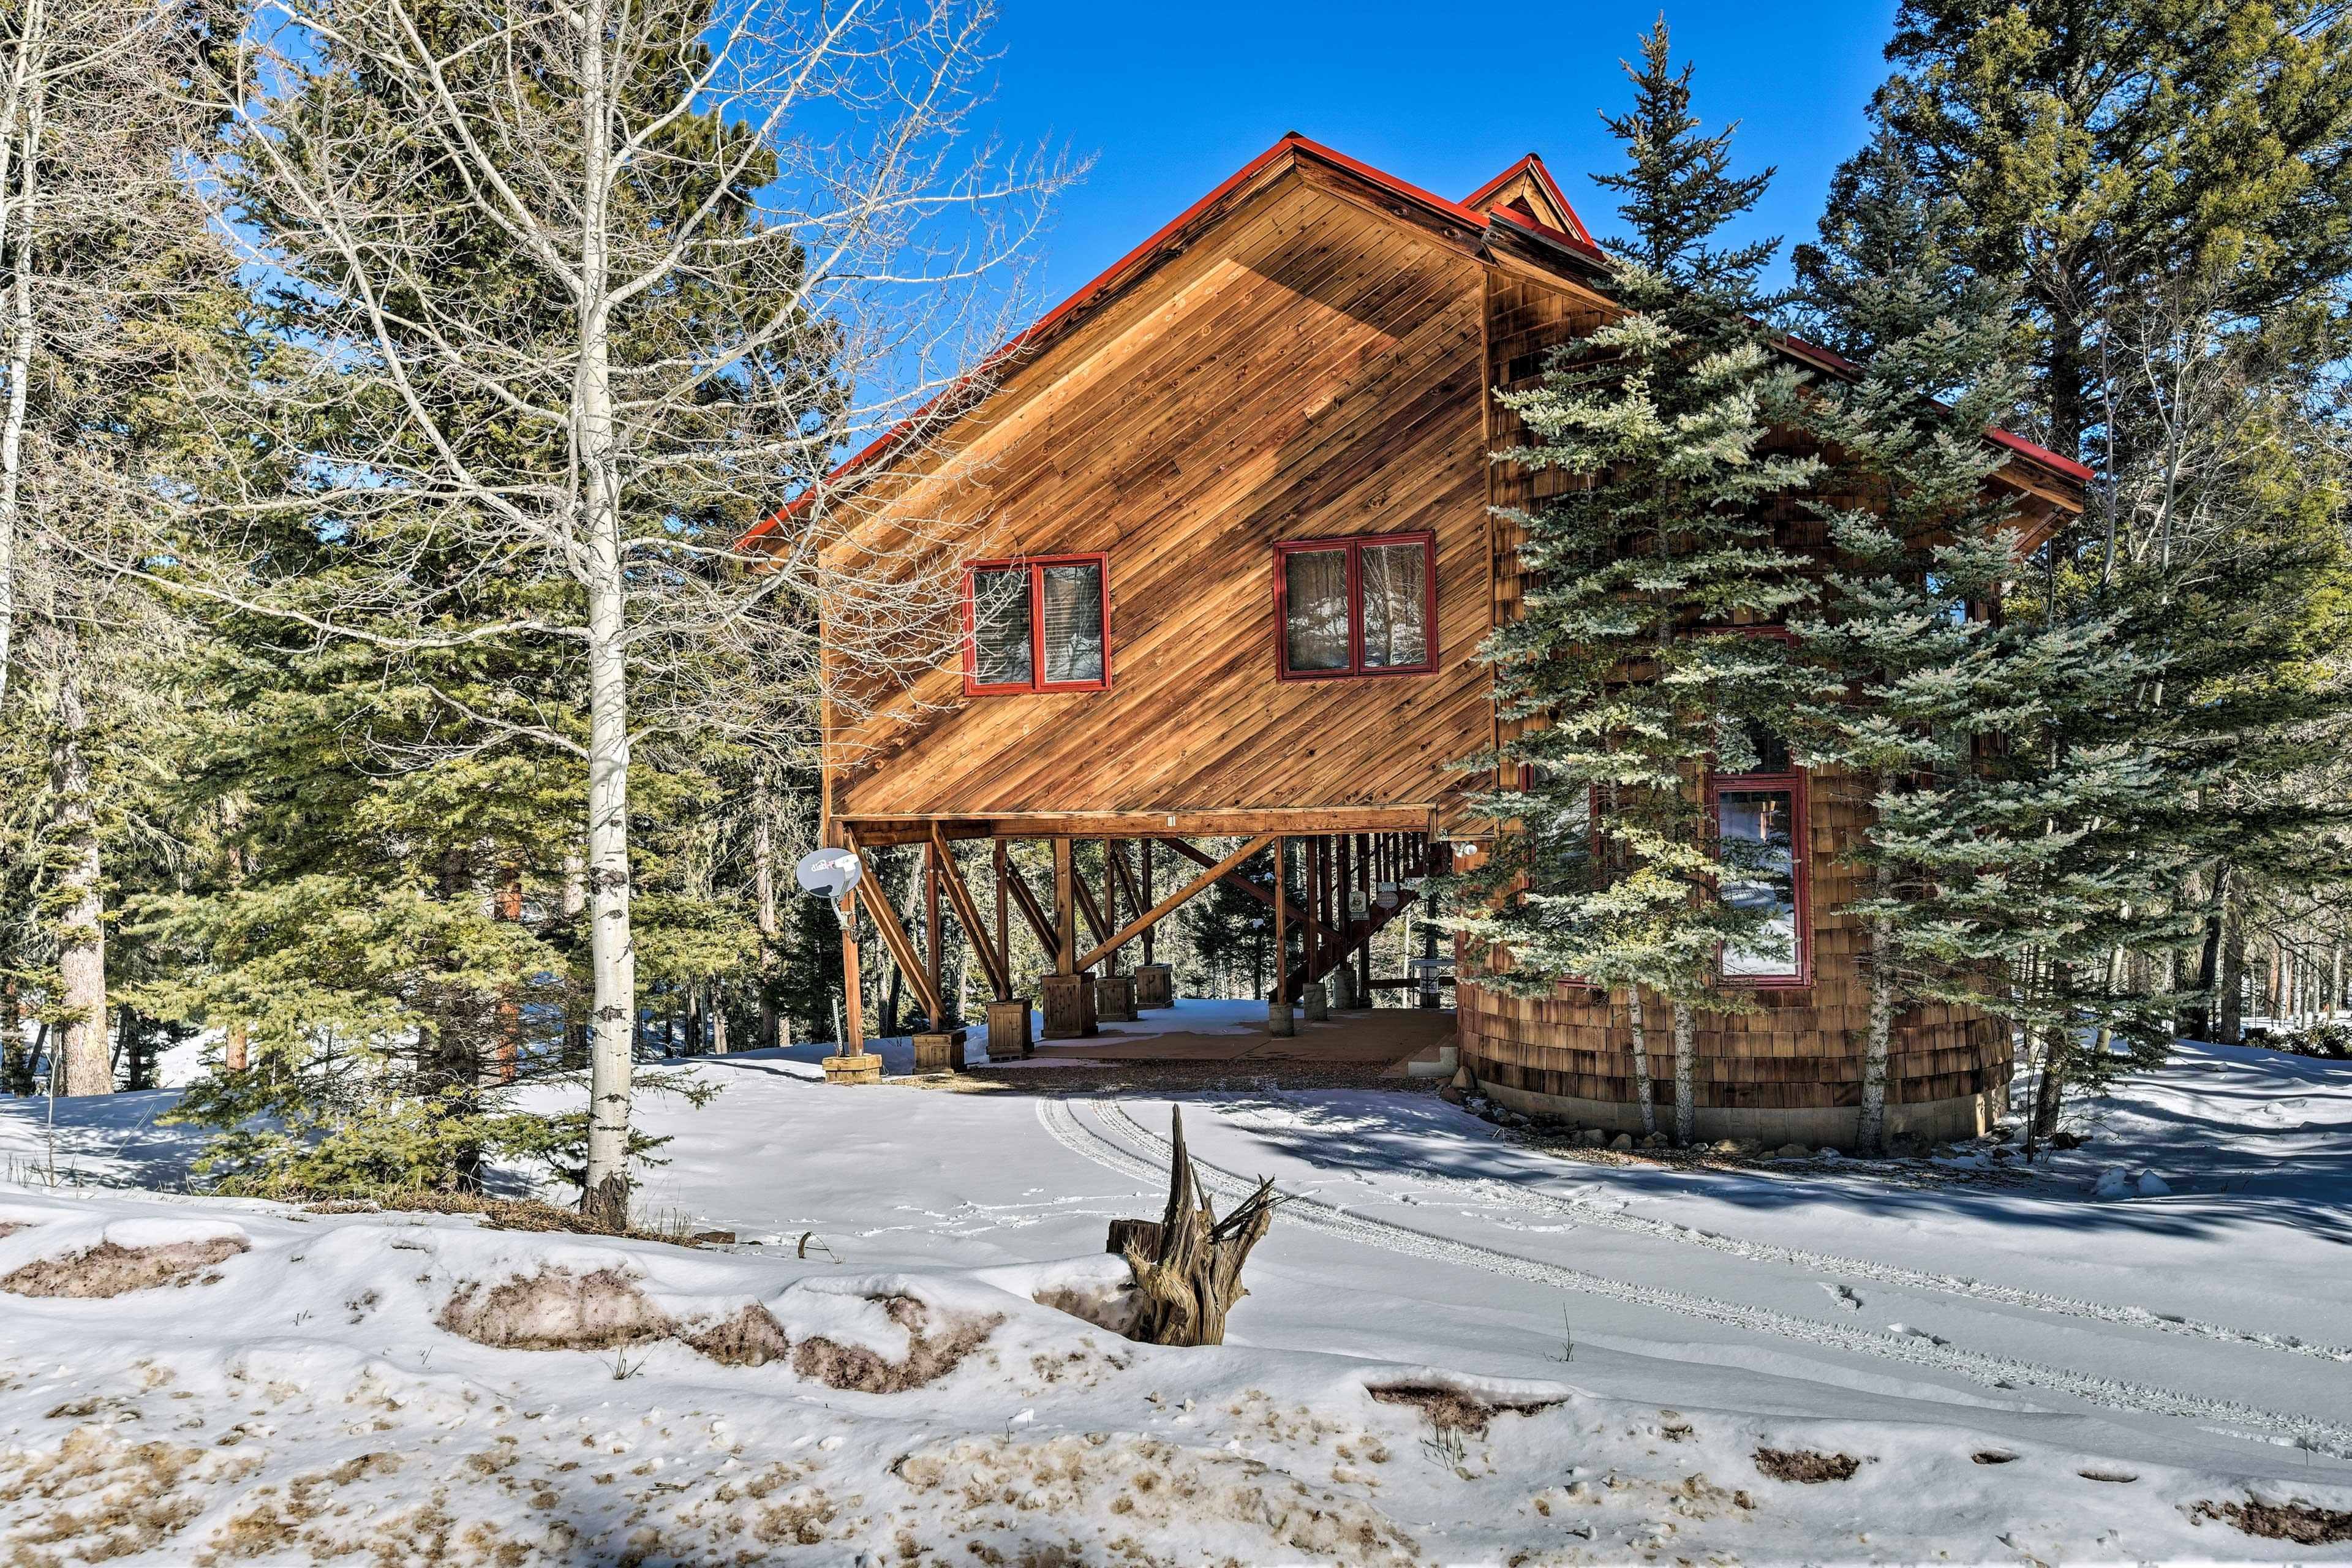 Angel Fire Resort boasts ski slopes, mountain bike trails, a golf course & more!